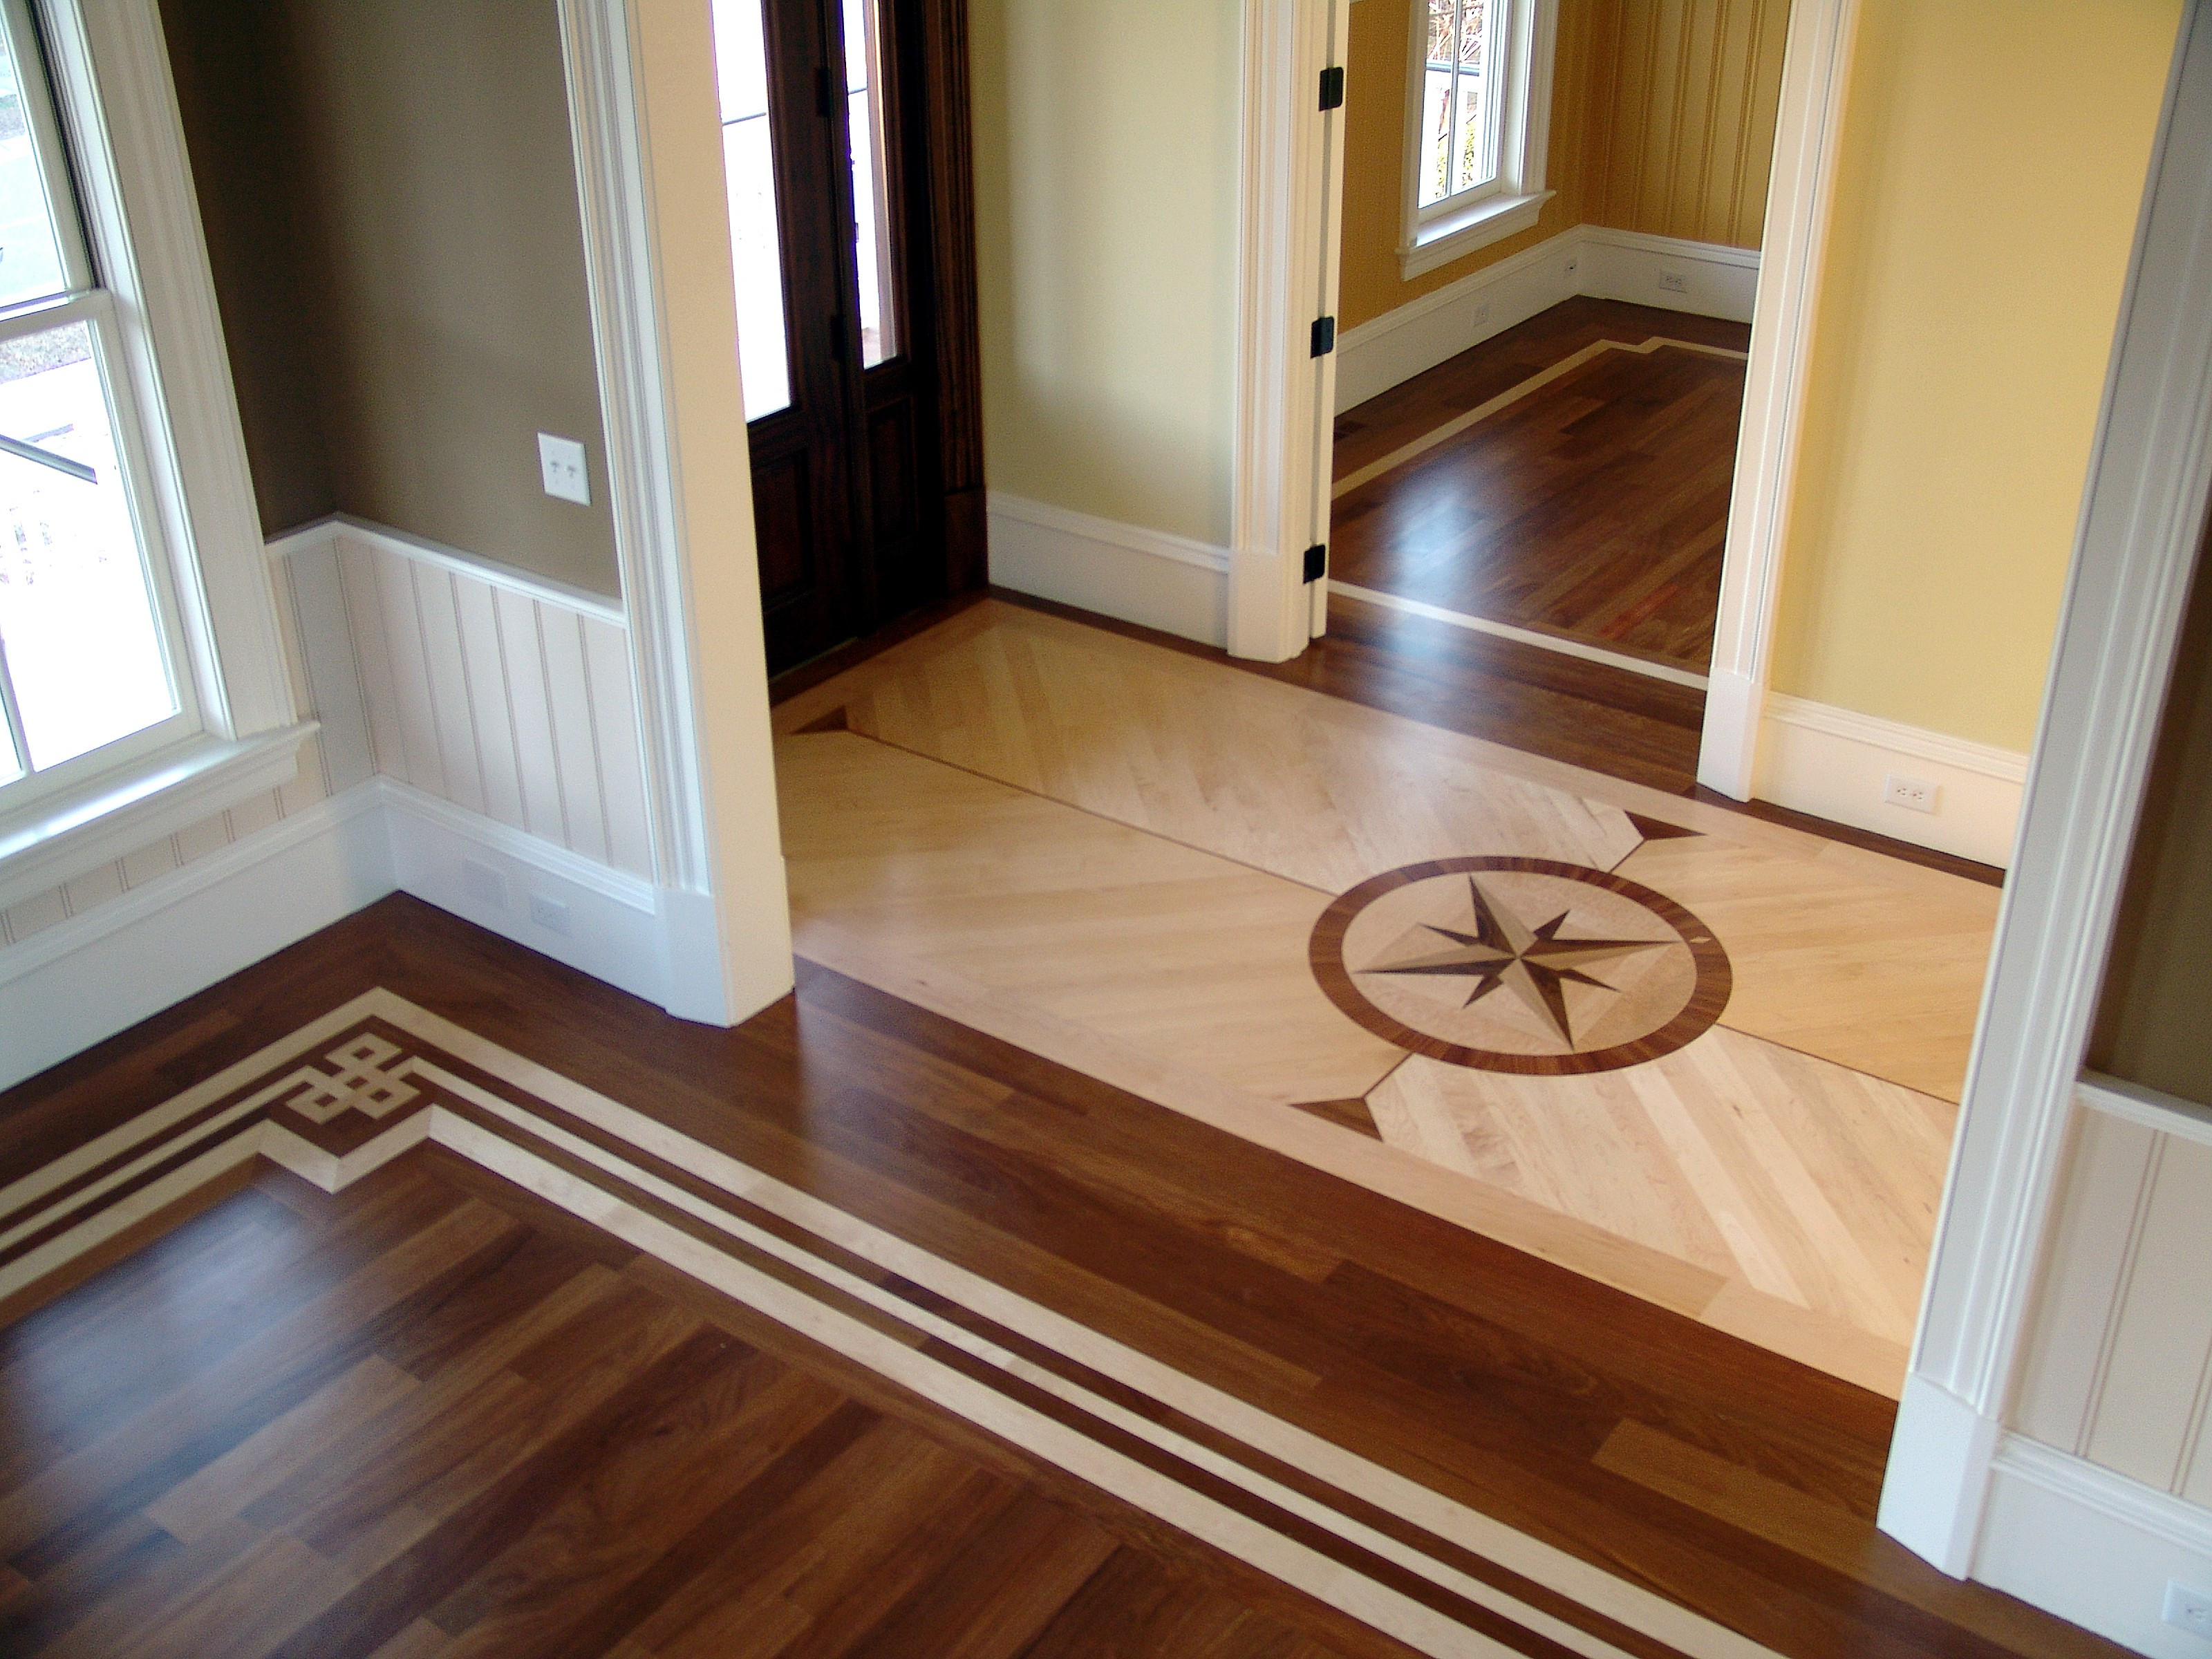 hardwood floor refinishing vs resurfacing of imperial wood floors madison wi hardwood floors hardwood floor with home a